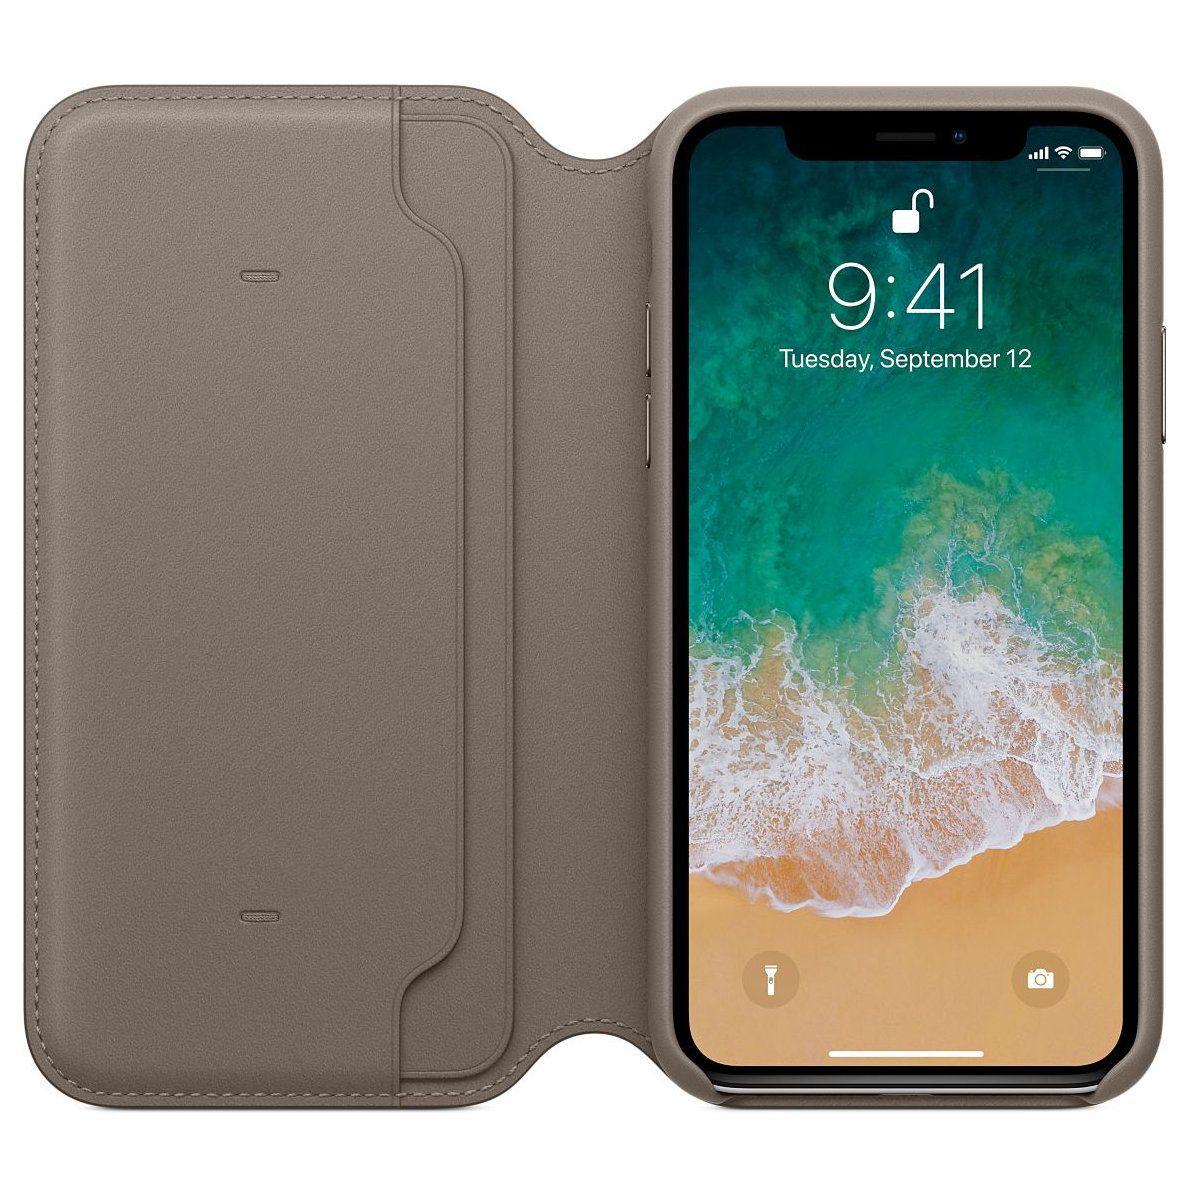 Iphone case wallet combo